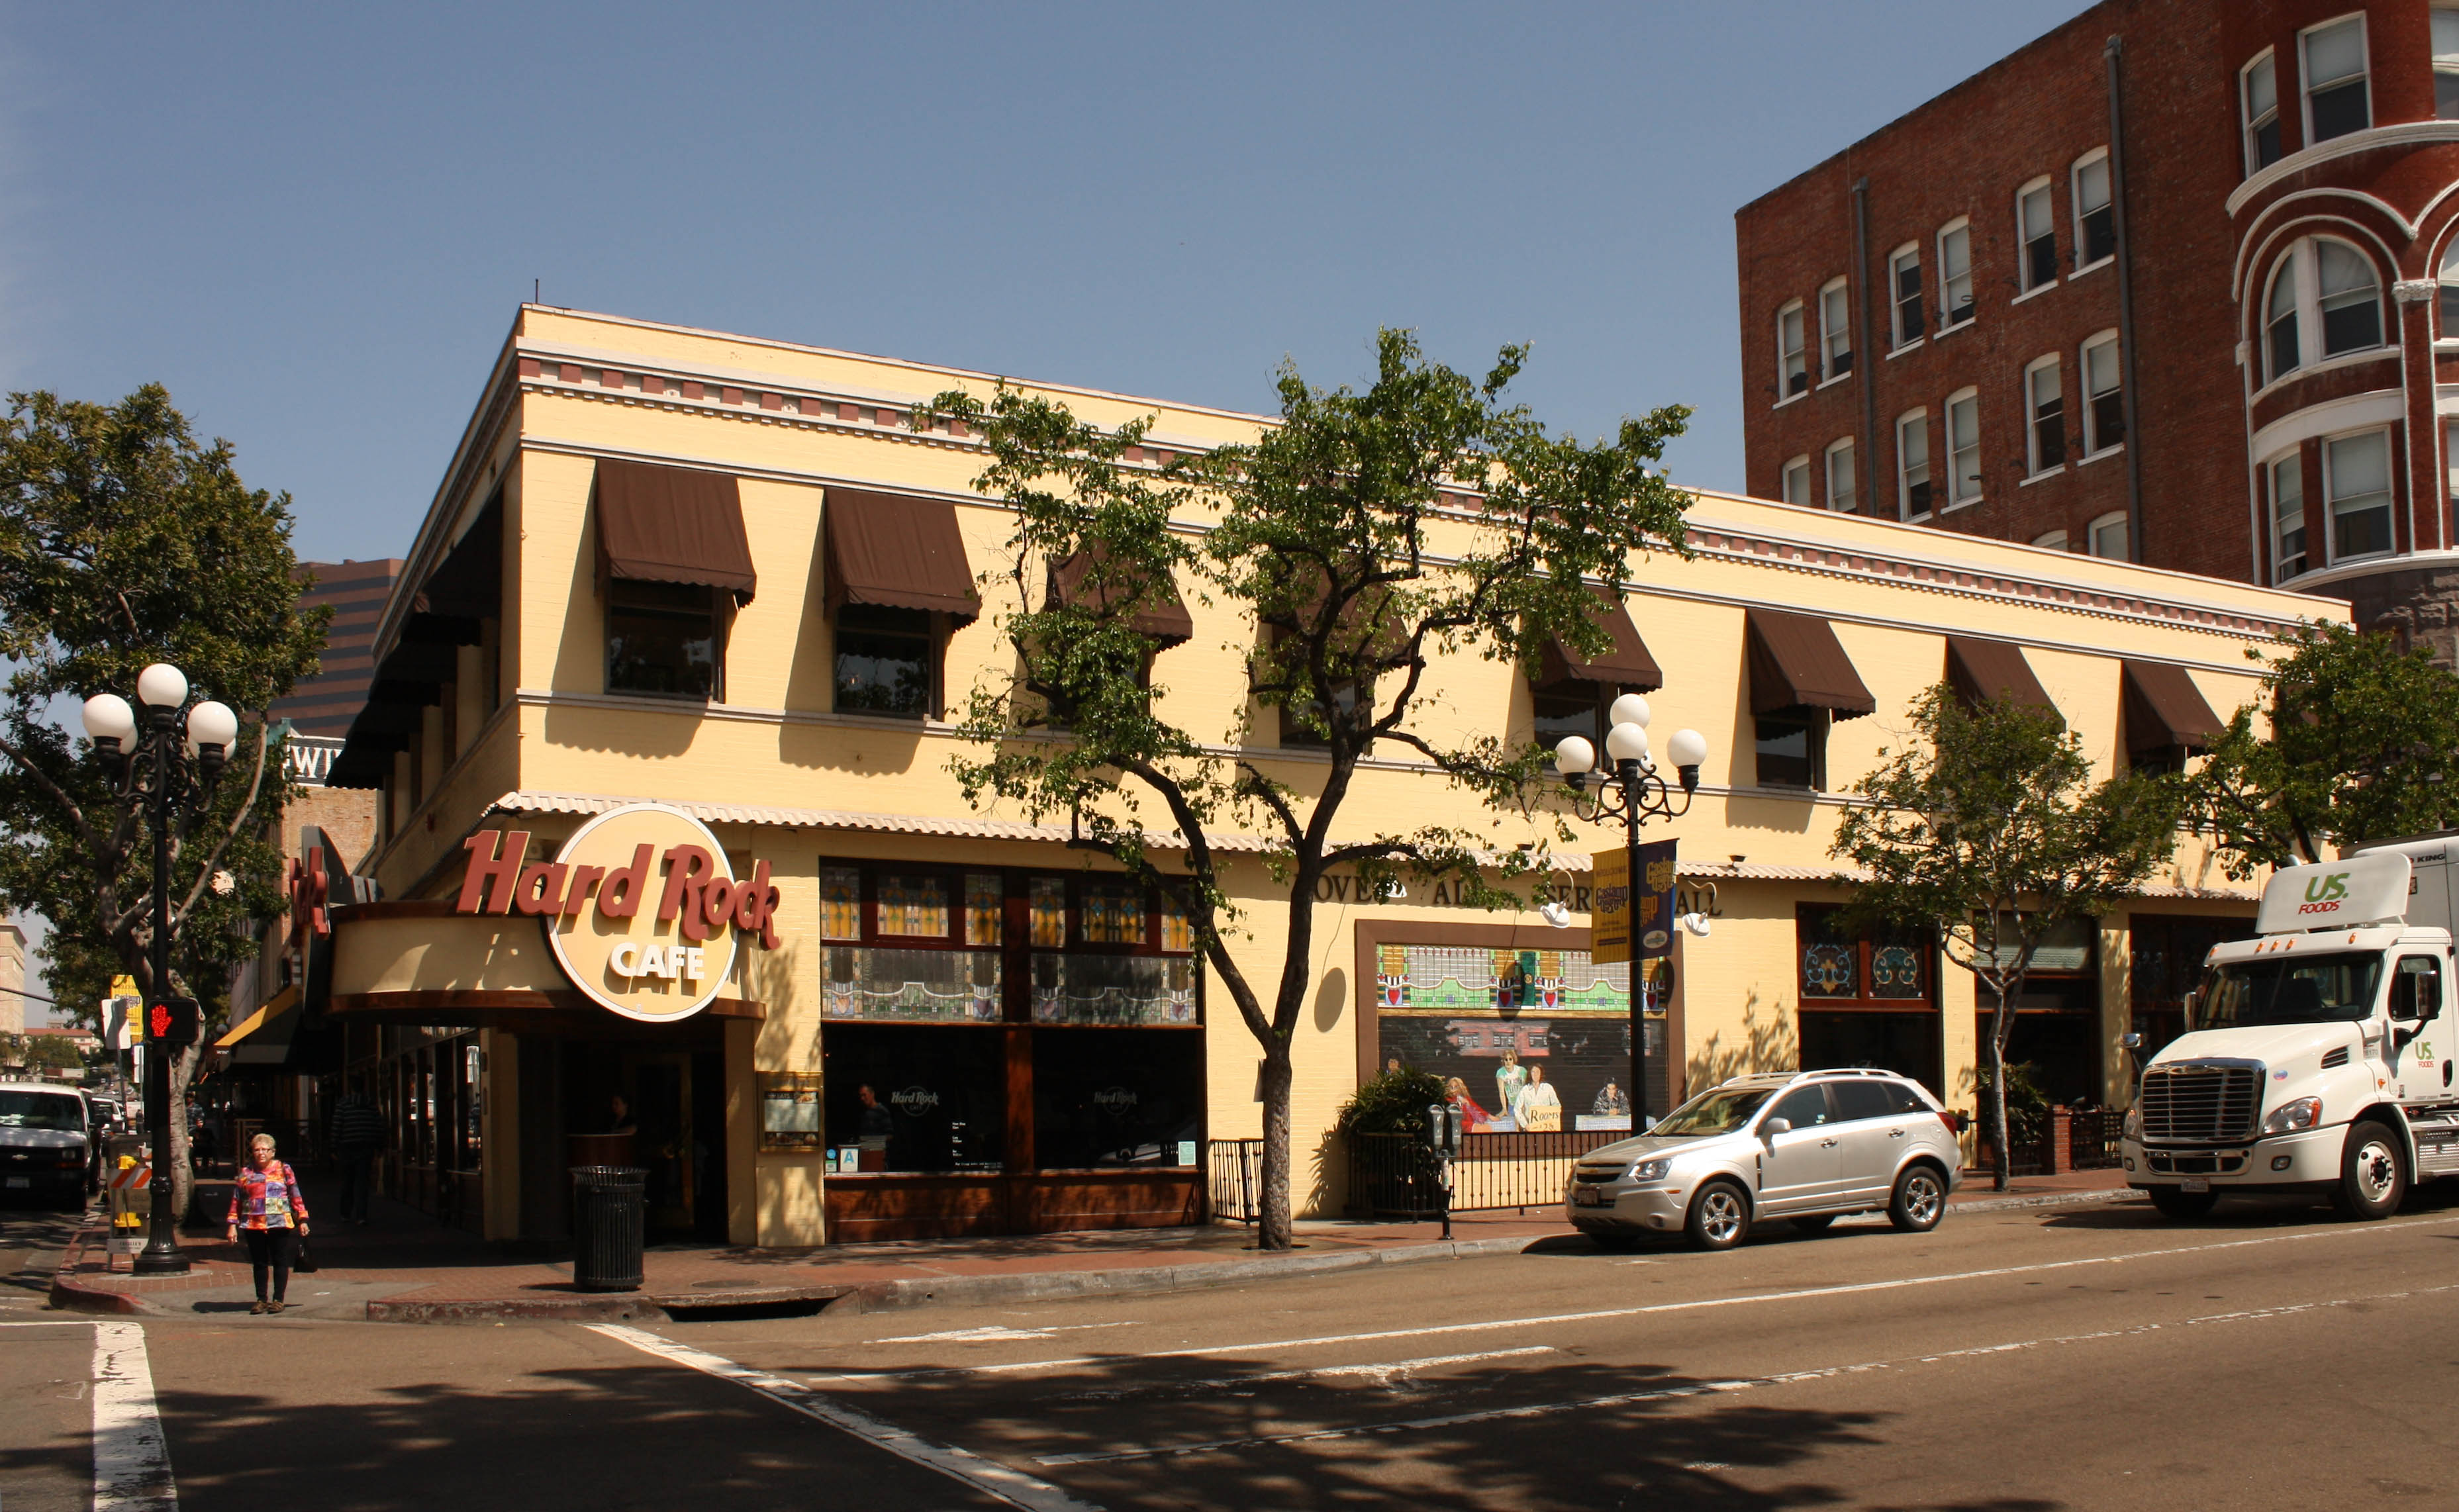 The Hard Rock Cafe San Diego